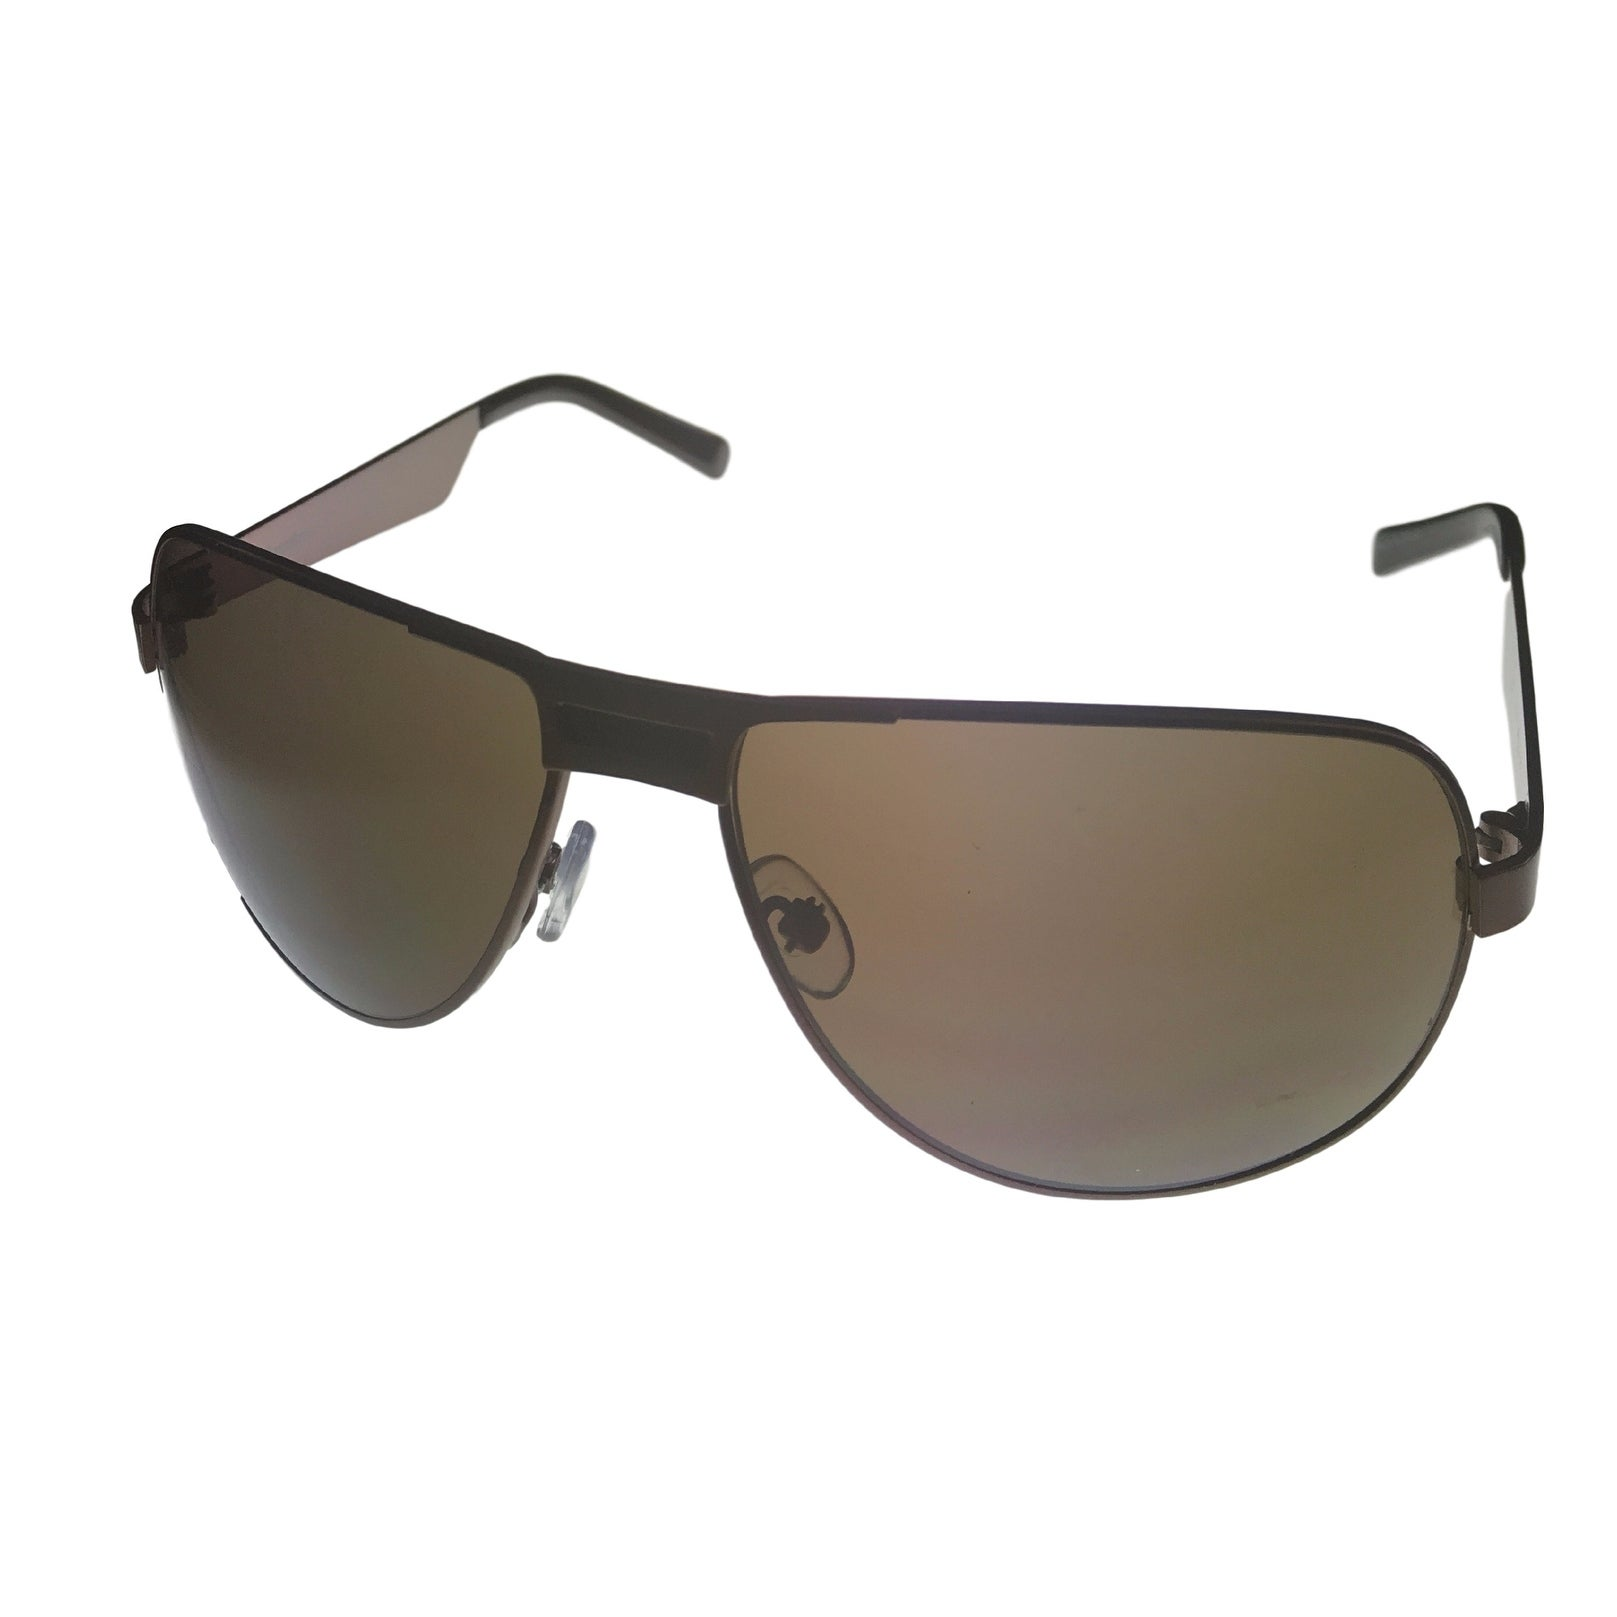 Umbro Sunglass Mens Black, Solid Smoke Lens Metal Sport Aviator US23 Gunmetal - Medium - Thumbnail 0